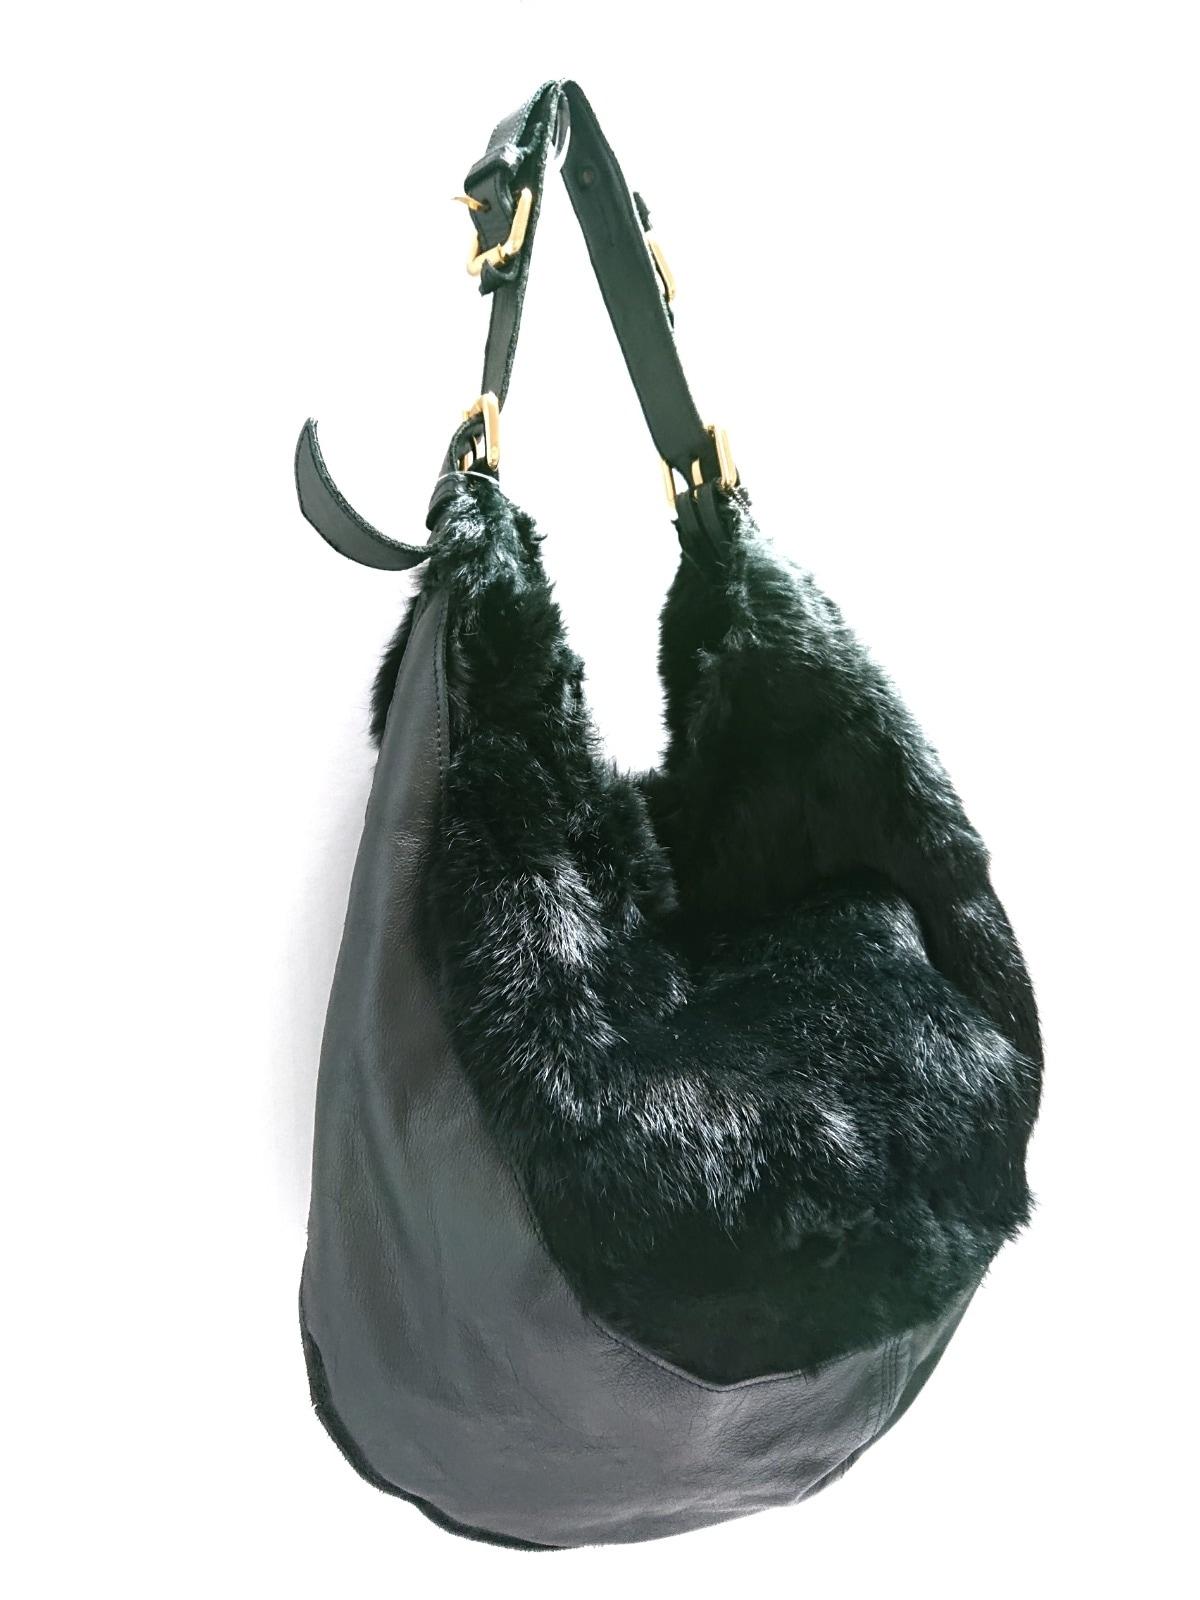 PHILIPPE ROUCOU(フィリップルクー)のショルダーバッグ